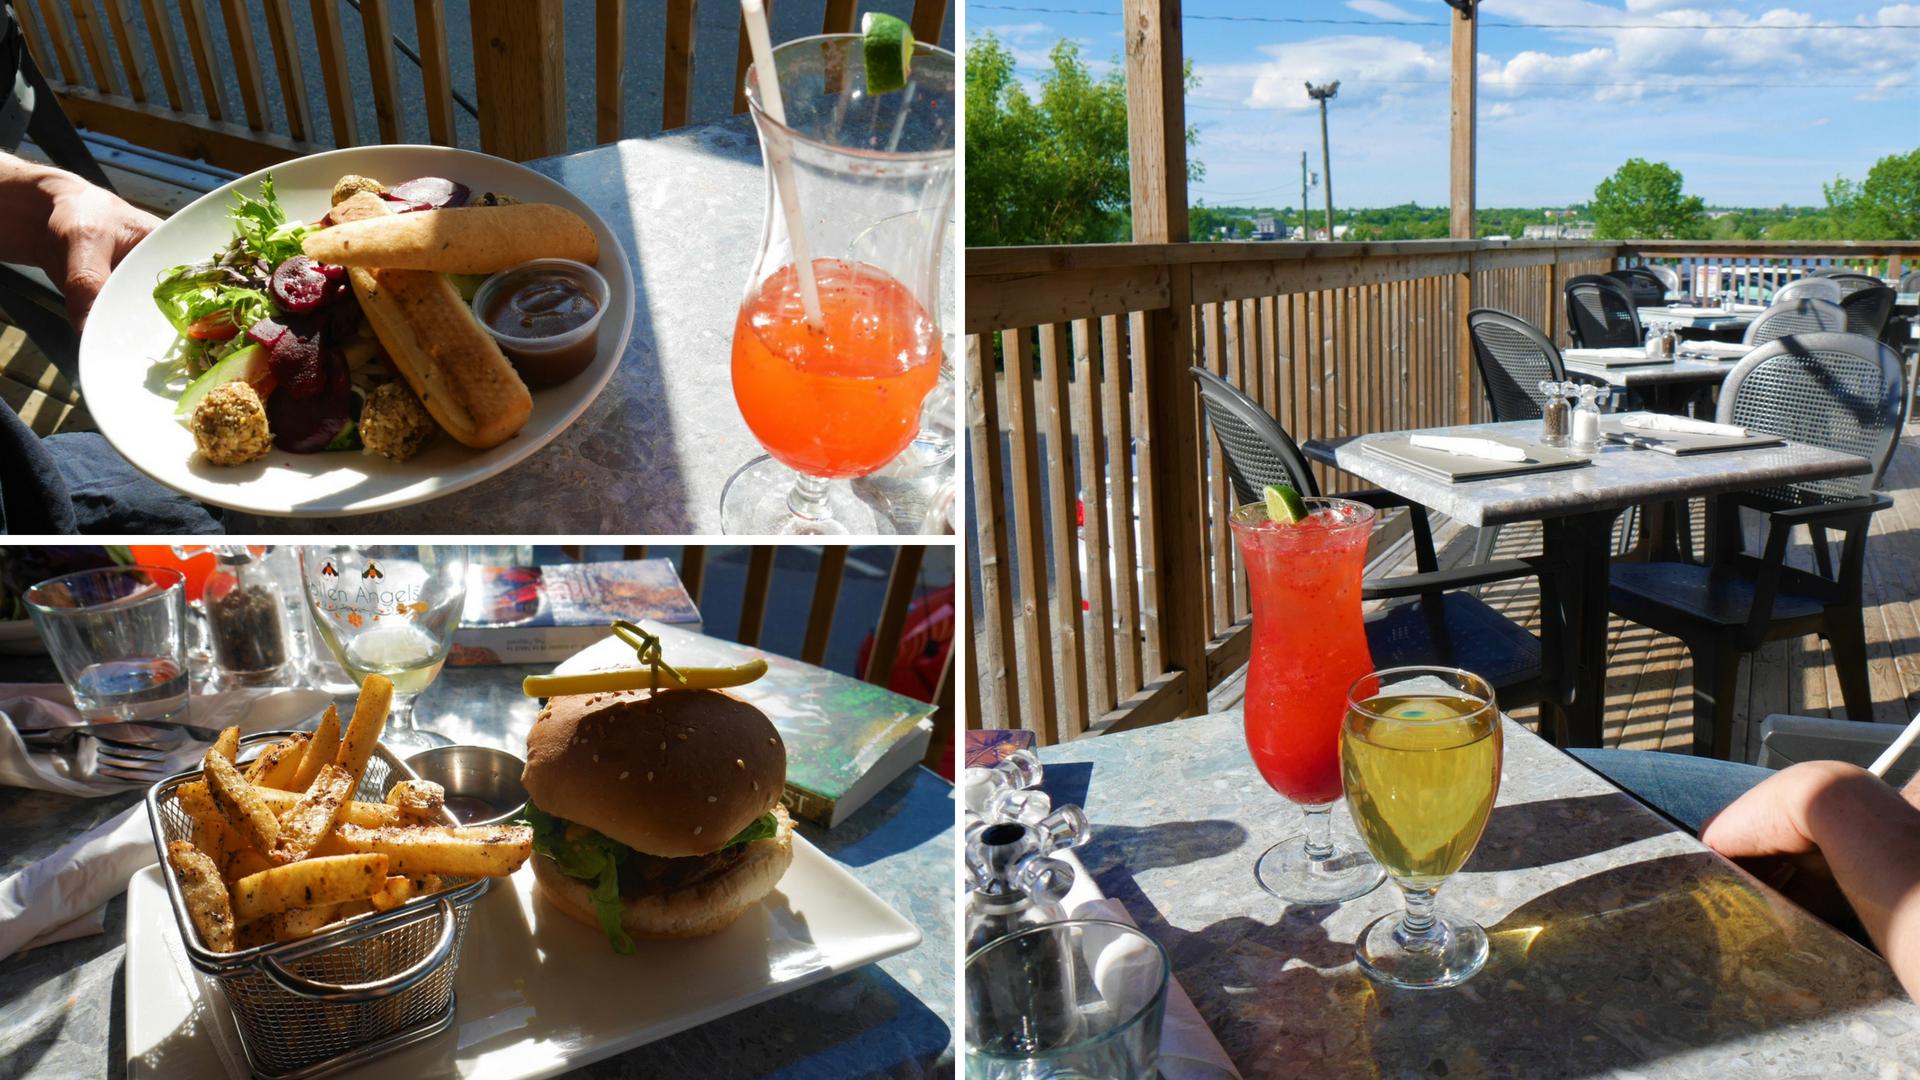 Fredericton diner souper isaac's way restaurant terrasse patio centre-ville